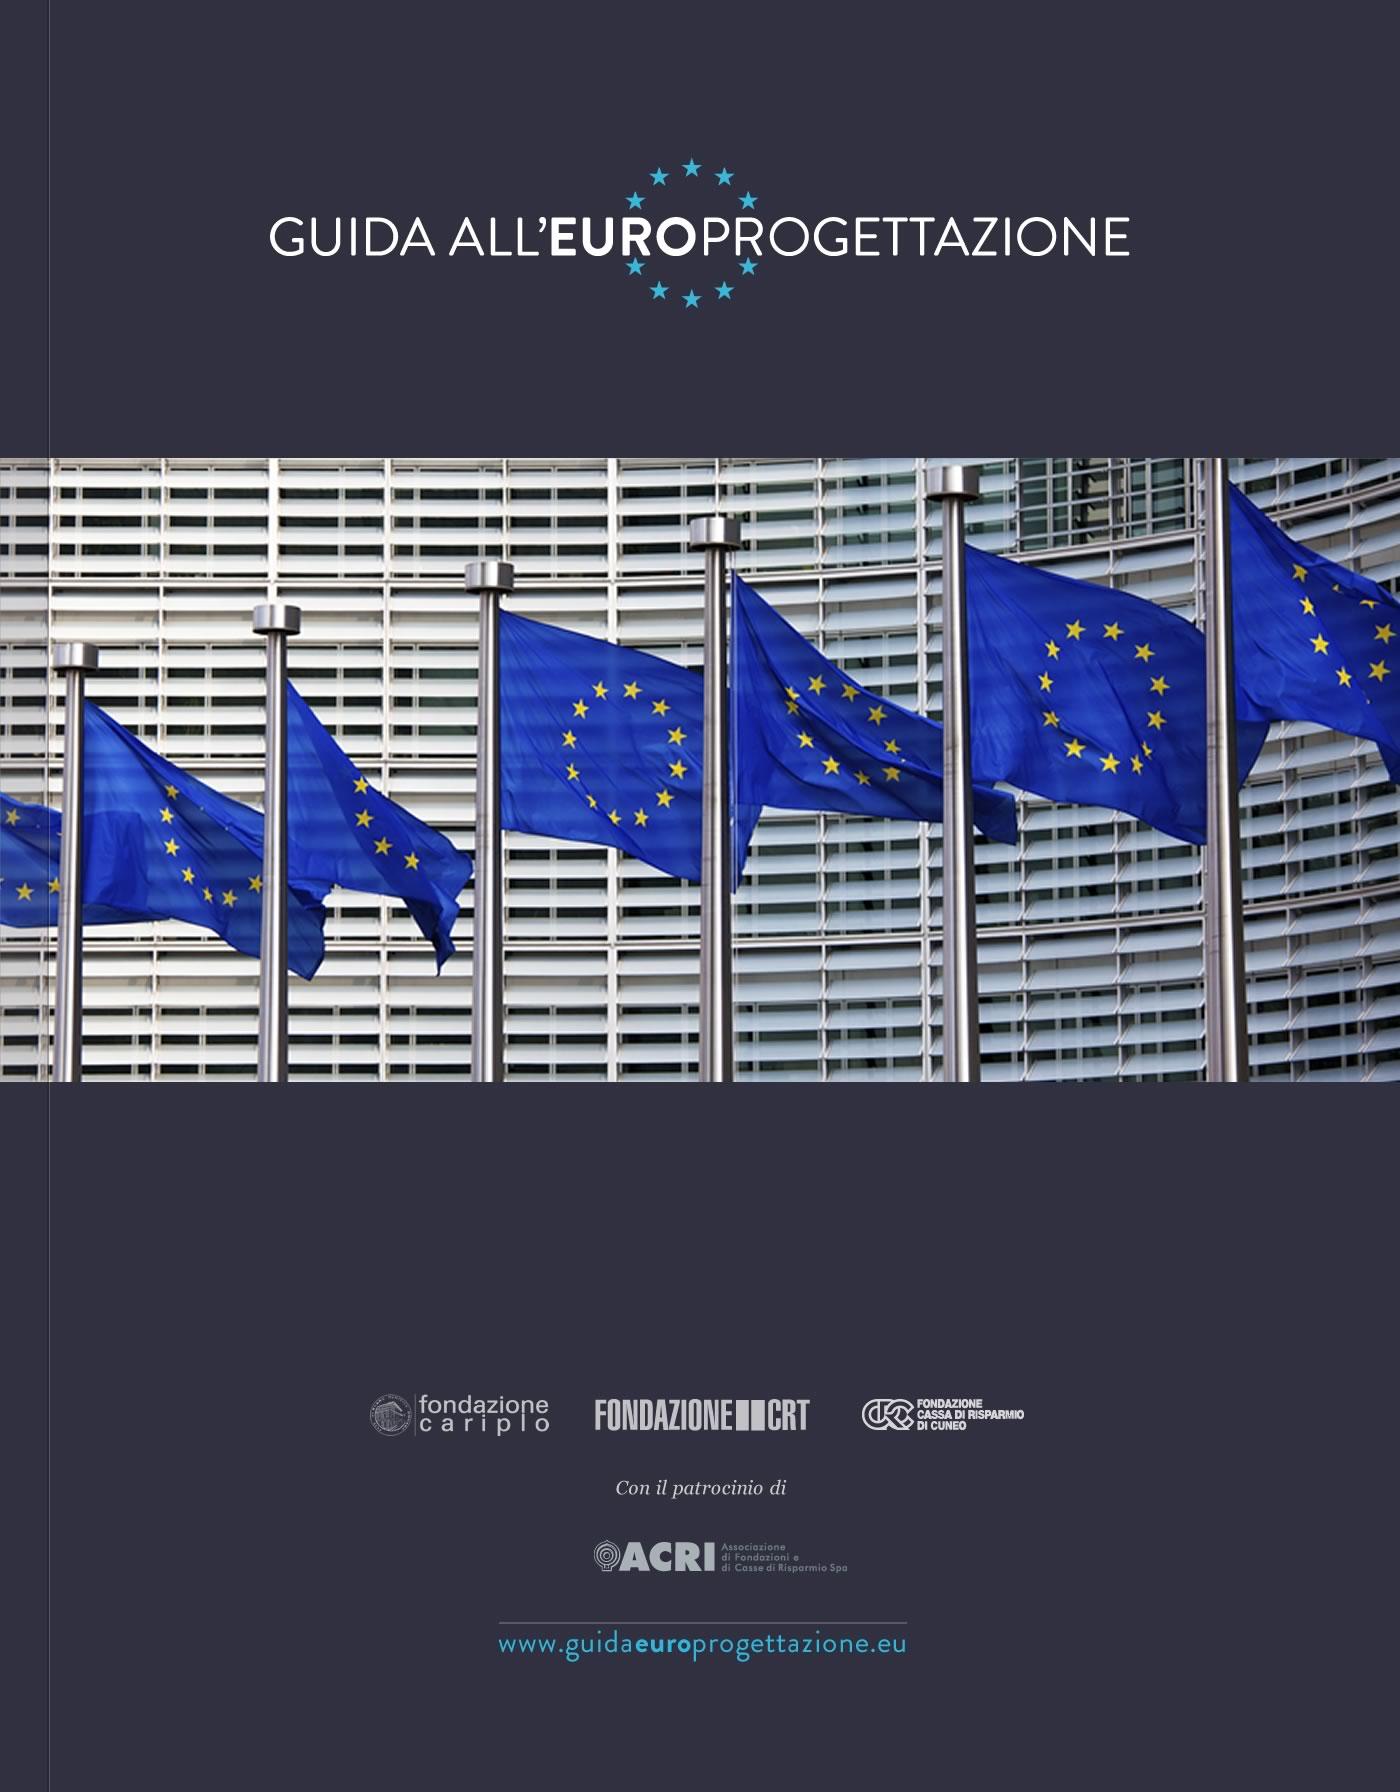 Copertina Guida Eurorpogettazione